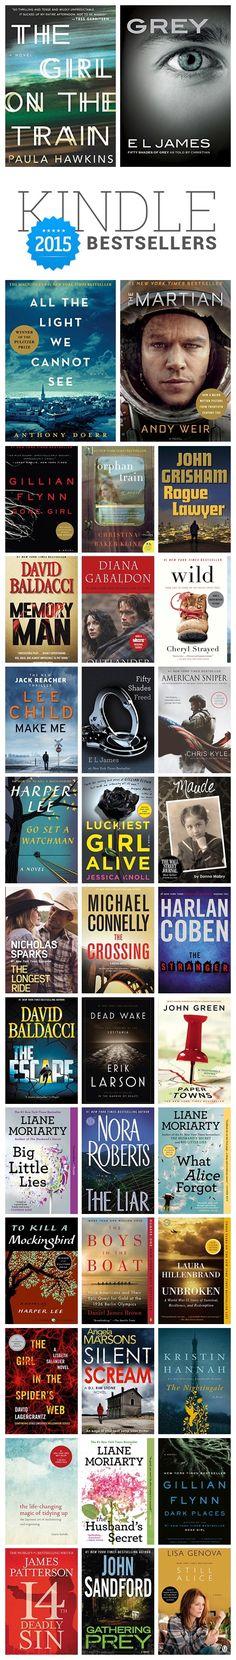 Paula Hawkins, Harper Lee, Anthony Doerr, Andy Weir, E.L. James ⇢ #Kindle #bestsellers 2015